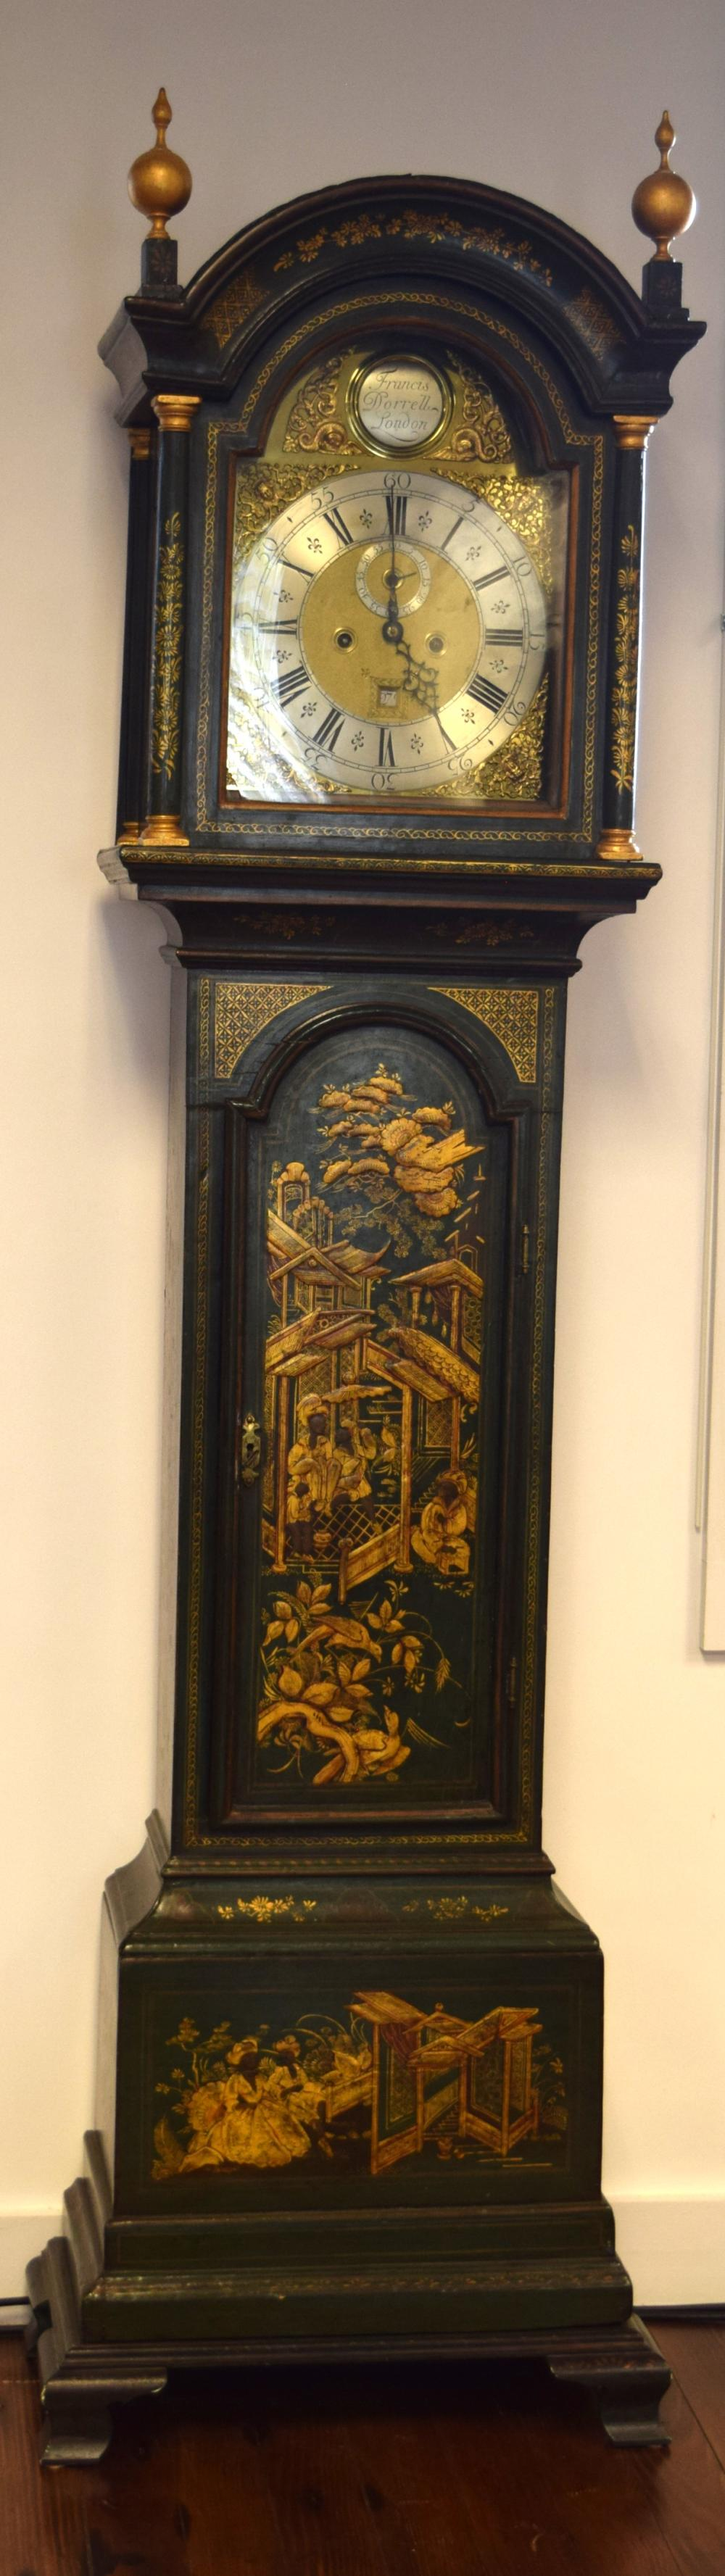 GEORGE III FRANCIS DORRELLI LONDON CHINOISERIE CASE TALL CLOCK: